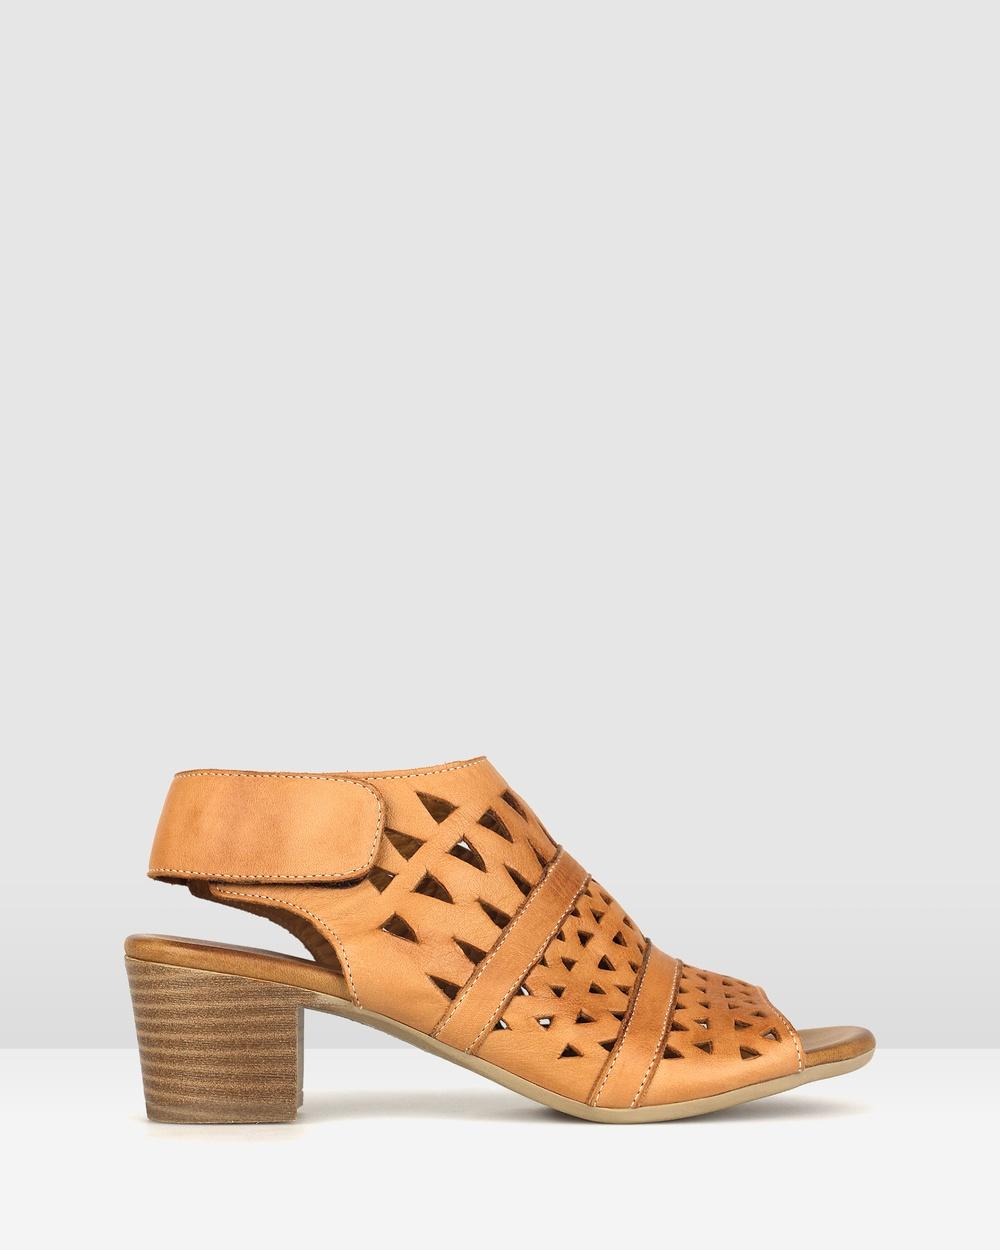 Airflex Delicious Cut Out Leather Sandals Tan